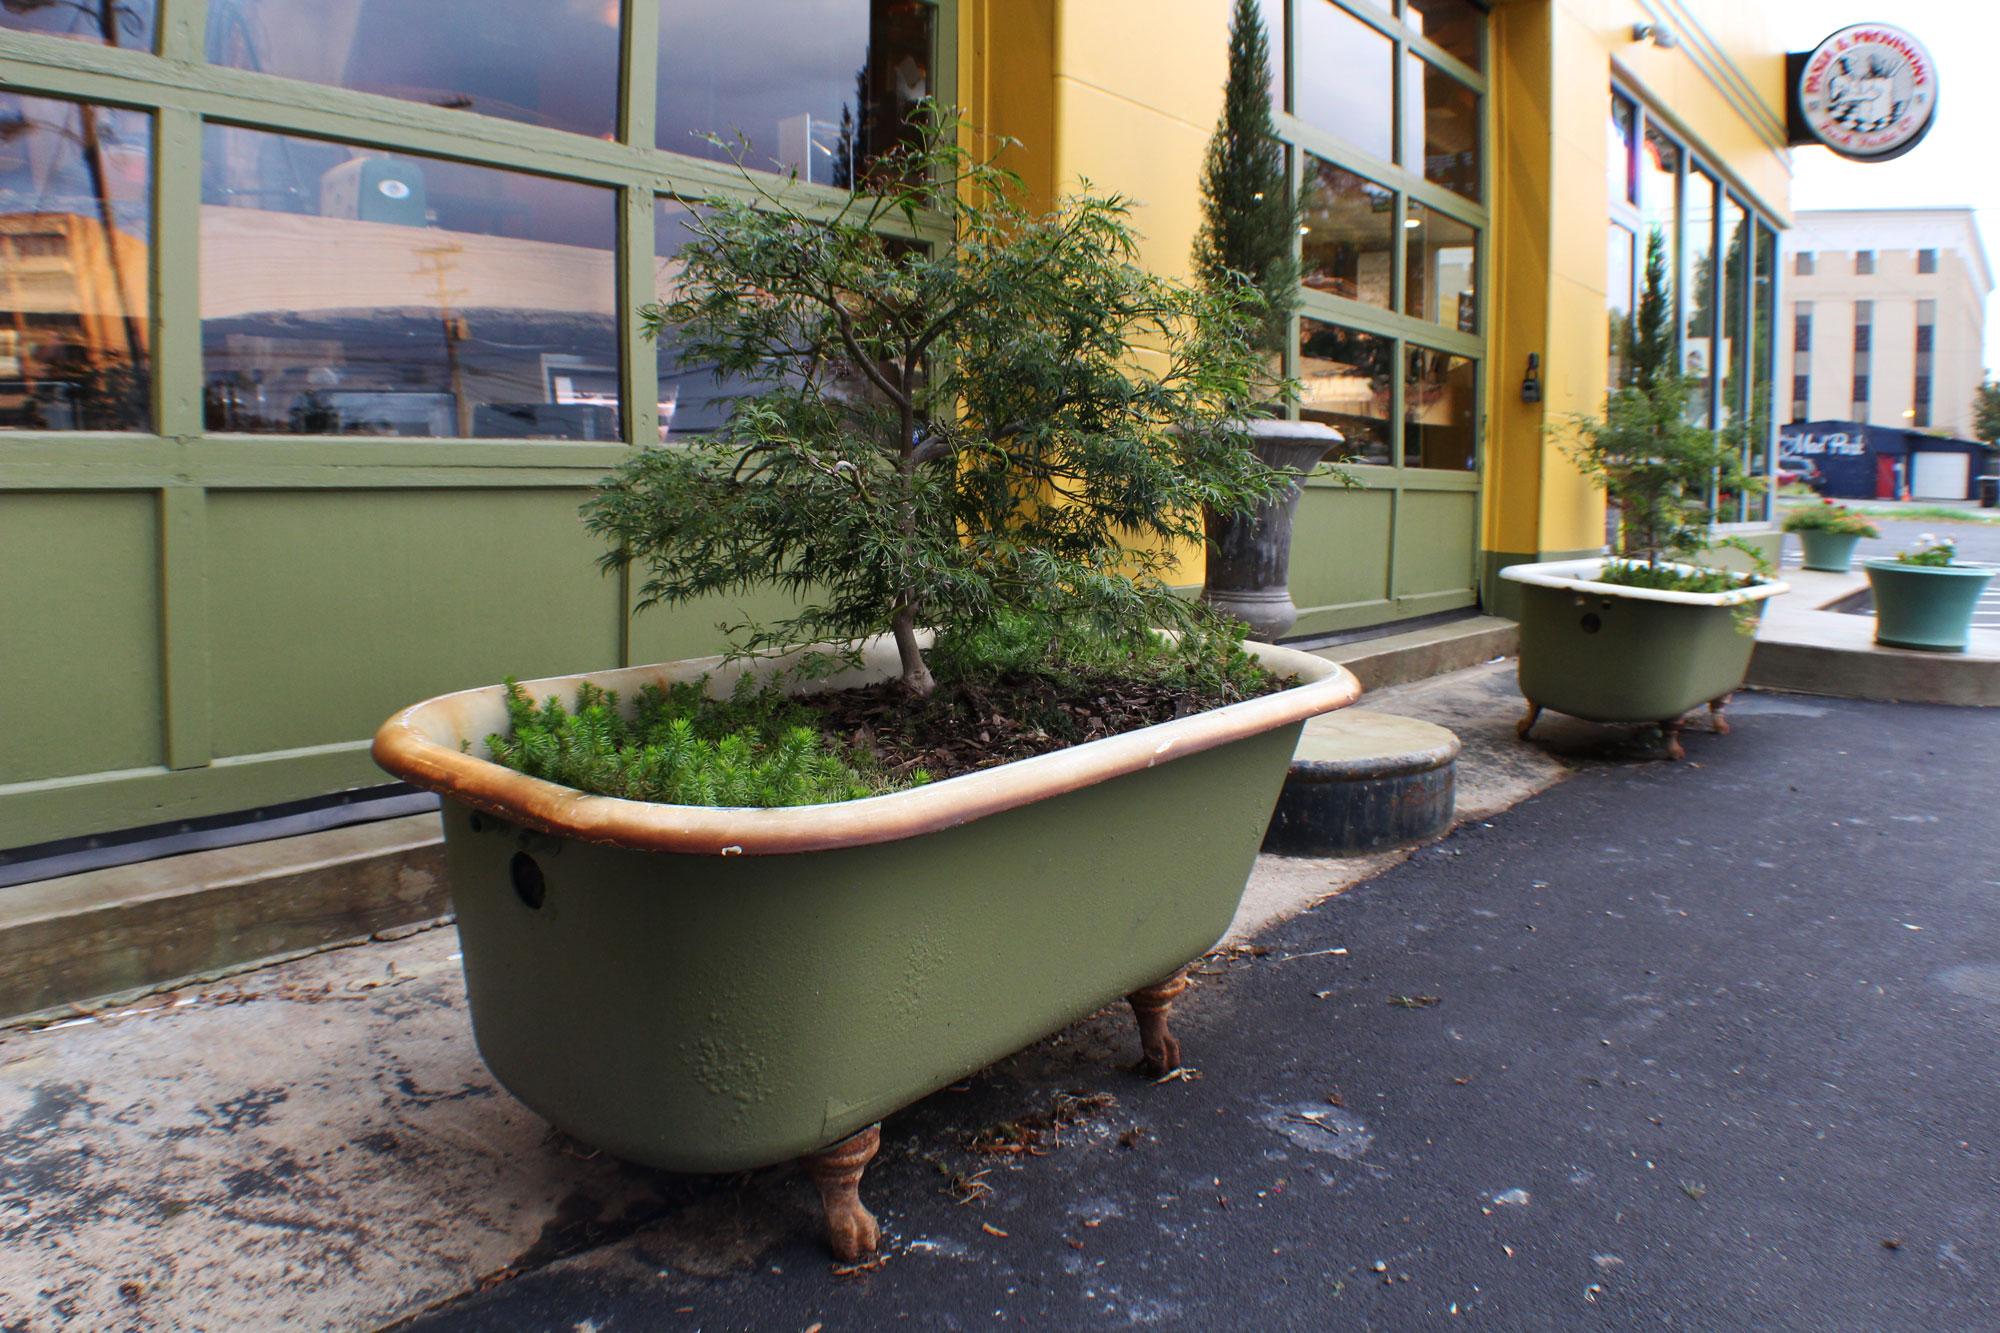 pasta_provisions_park_bonsai_tub.jpg